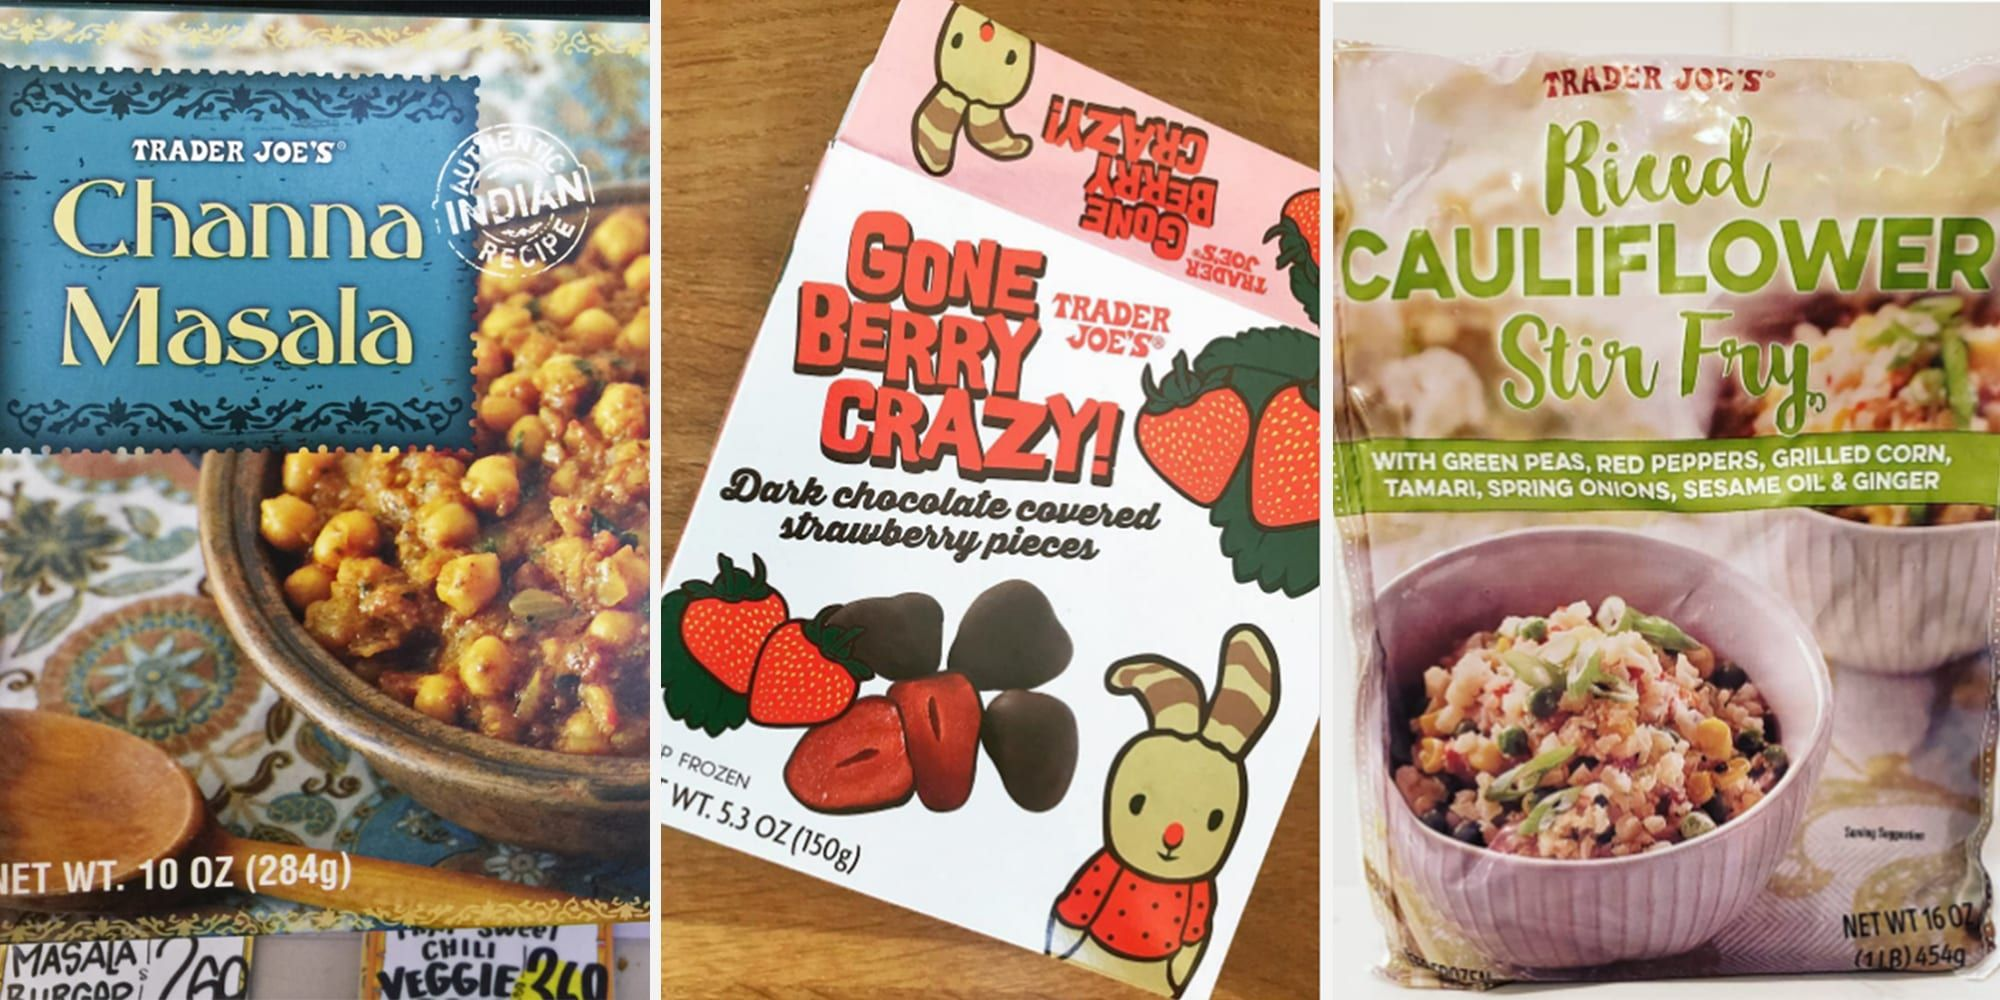 15 of the Healthiest Frozen Foods from Trader Joe's in